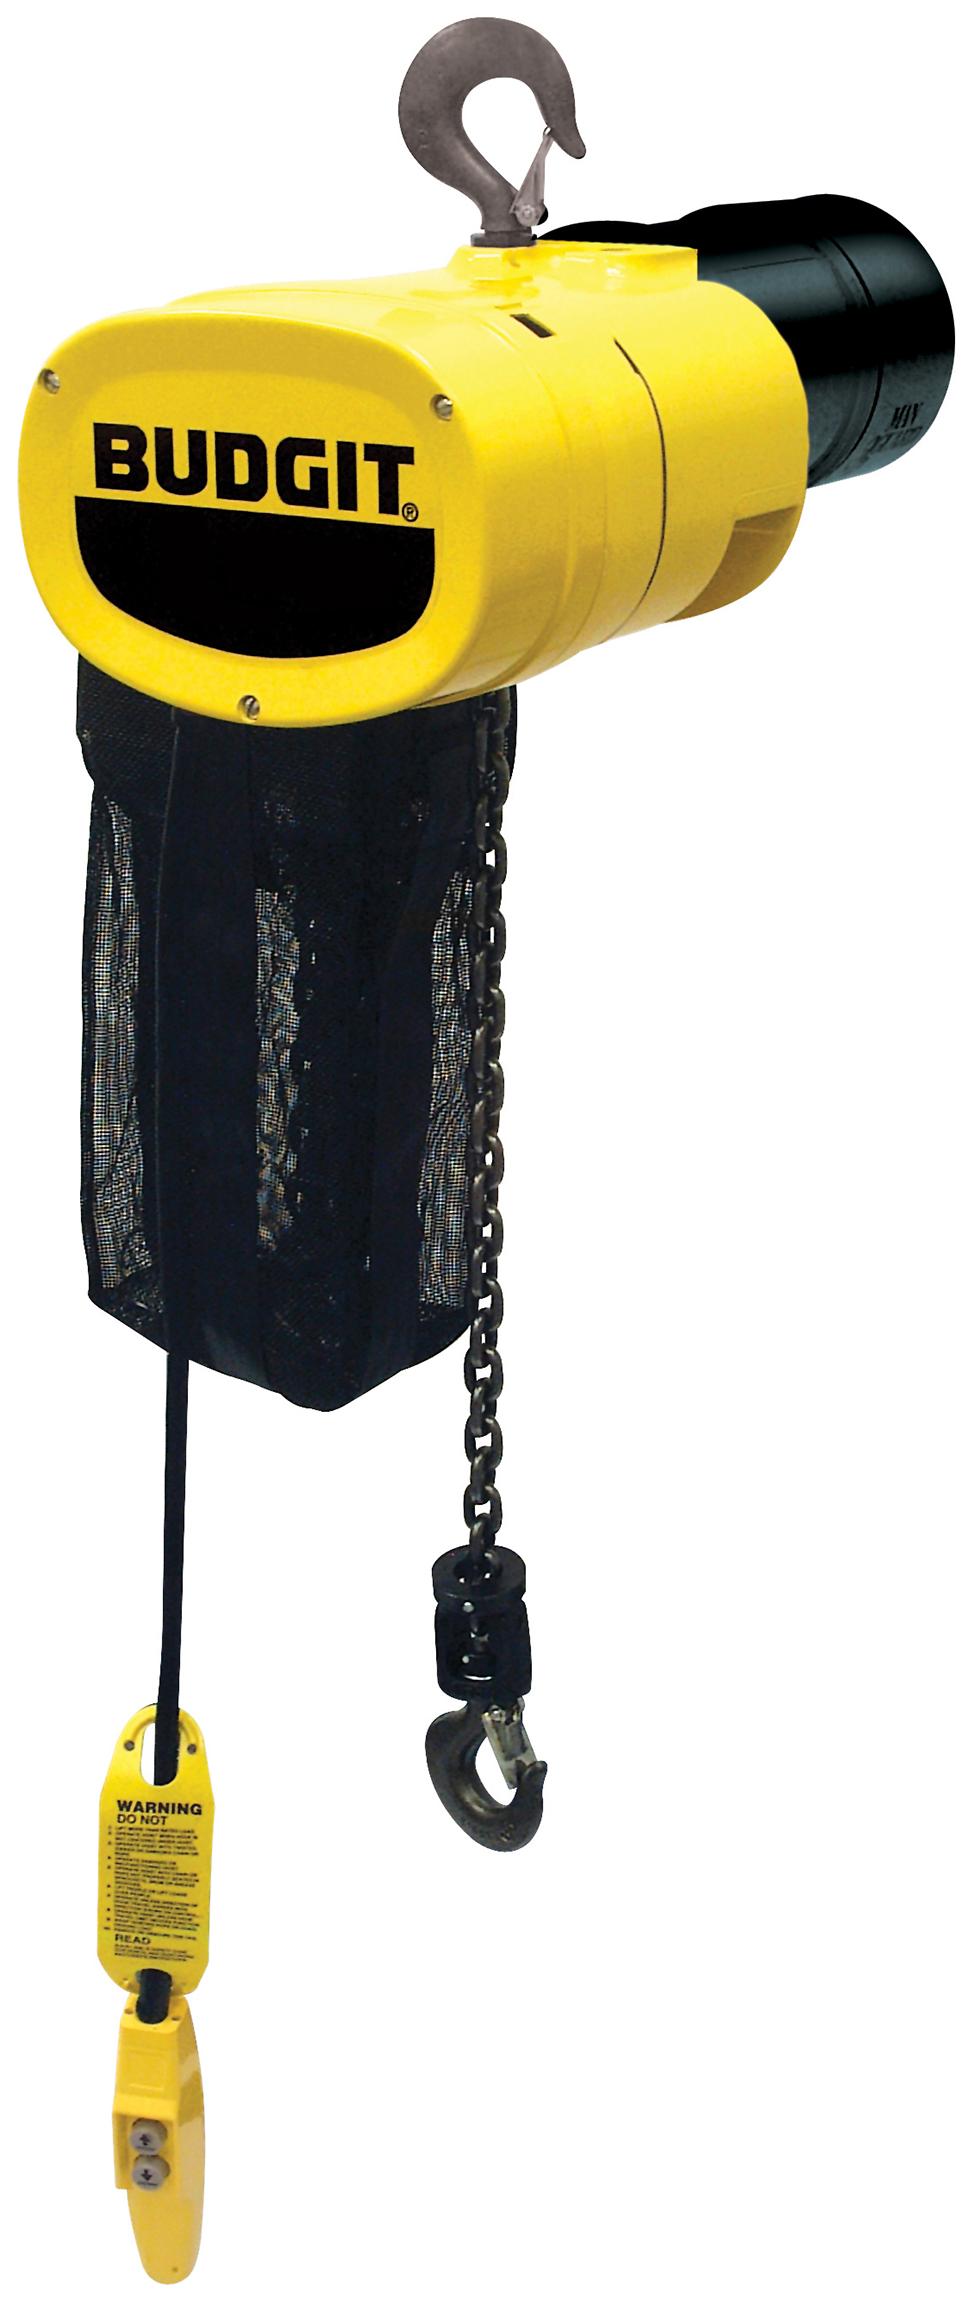 Budgit Man Guard Electric Chain Hoist, Hook Mount